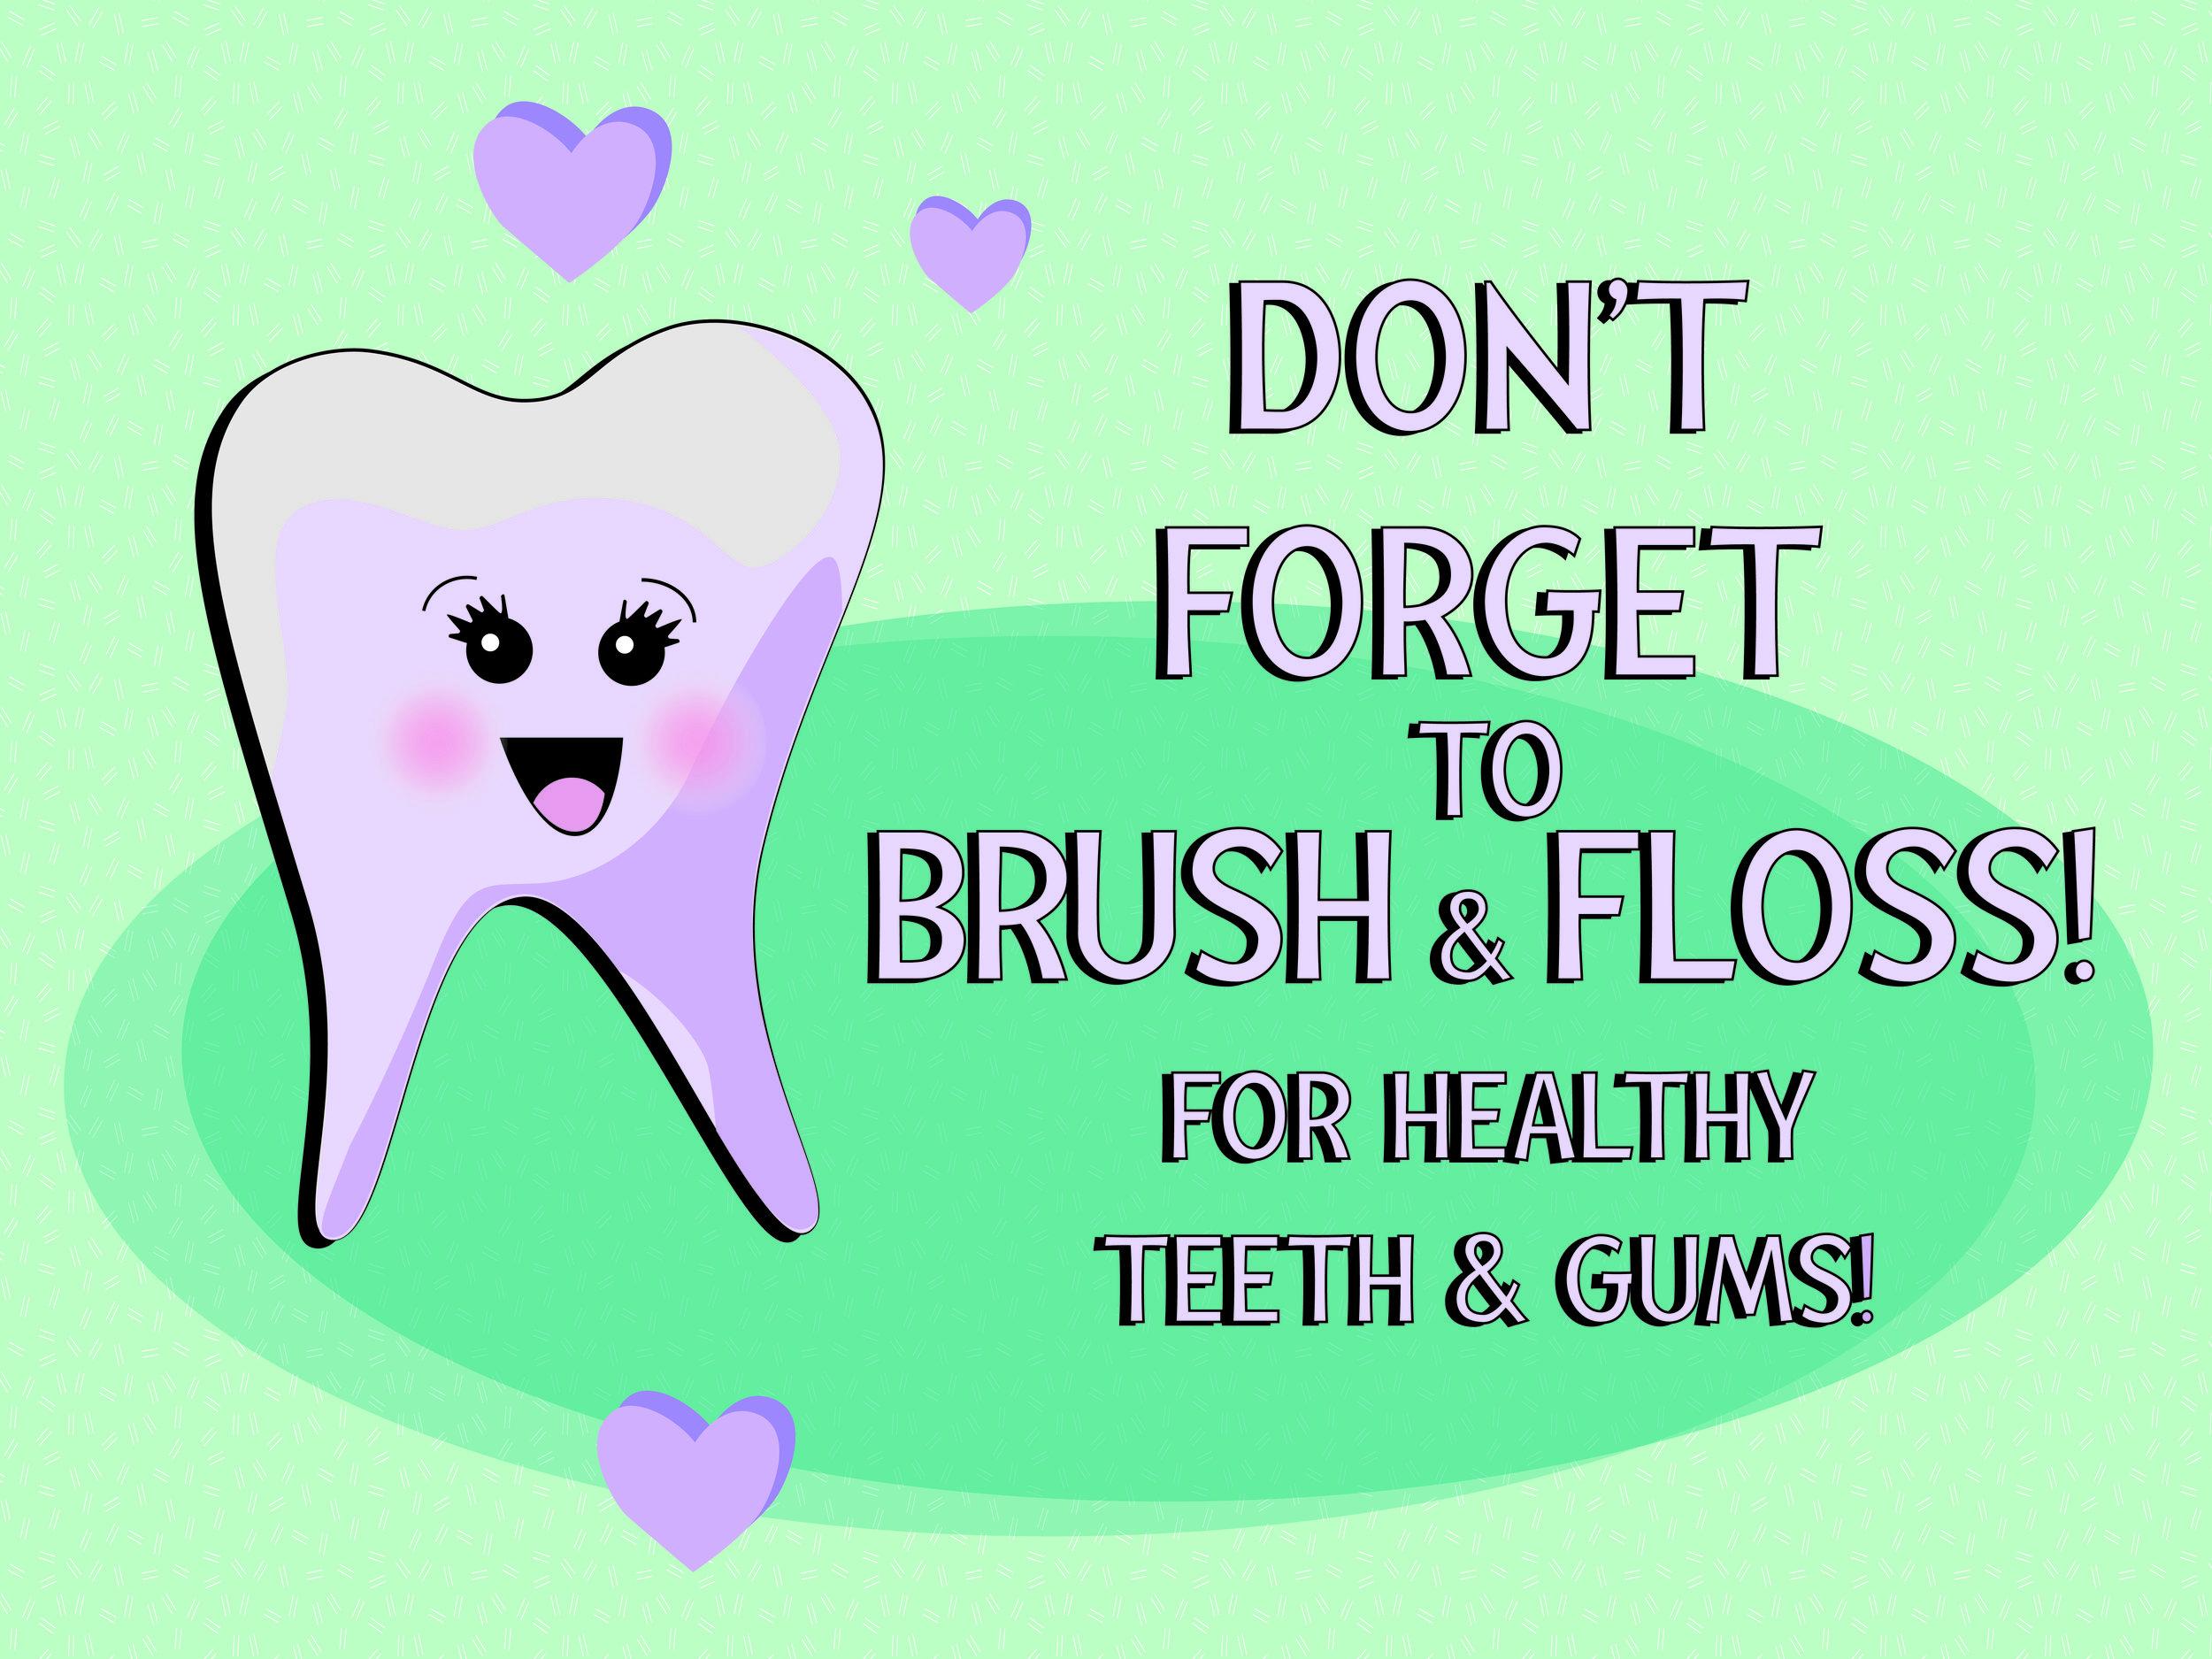 Dental_Posters_24x18_Dontforget.jpg